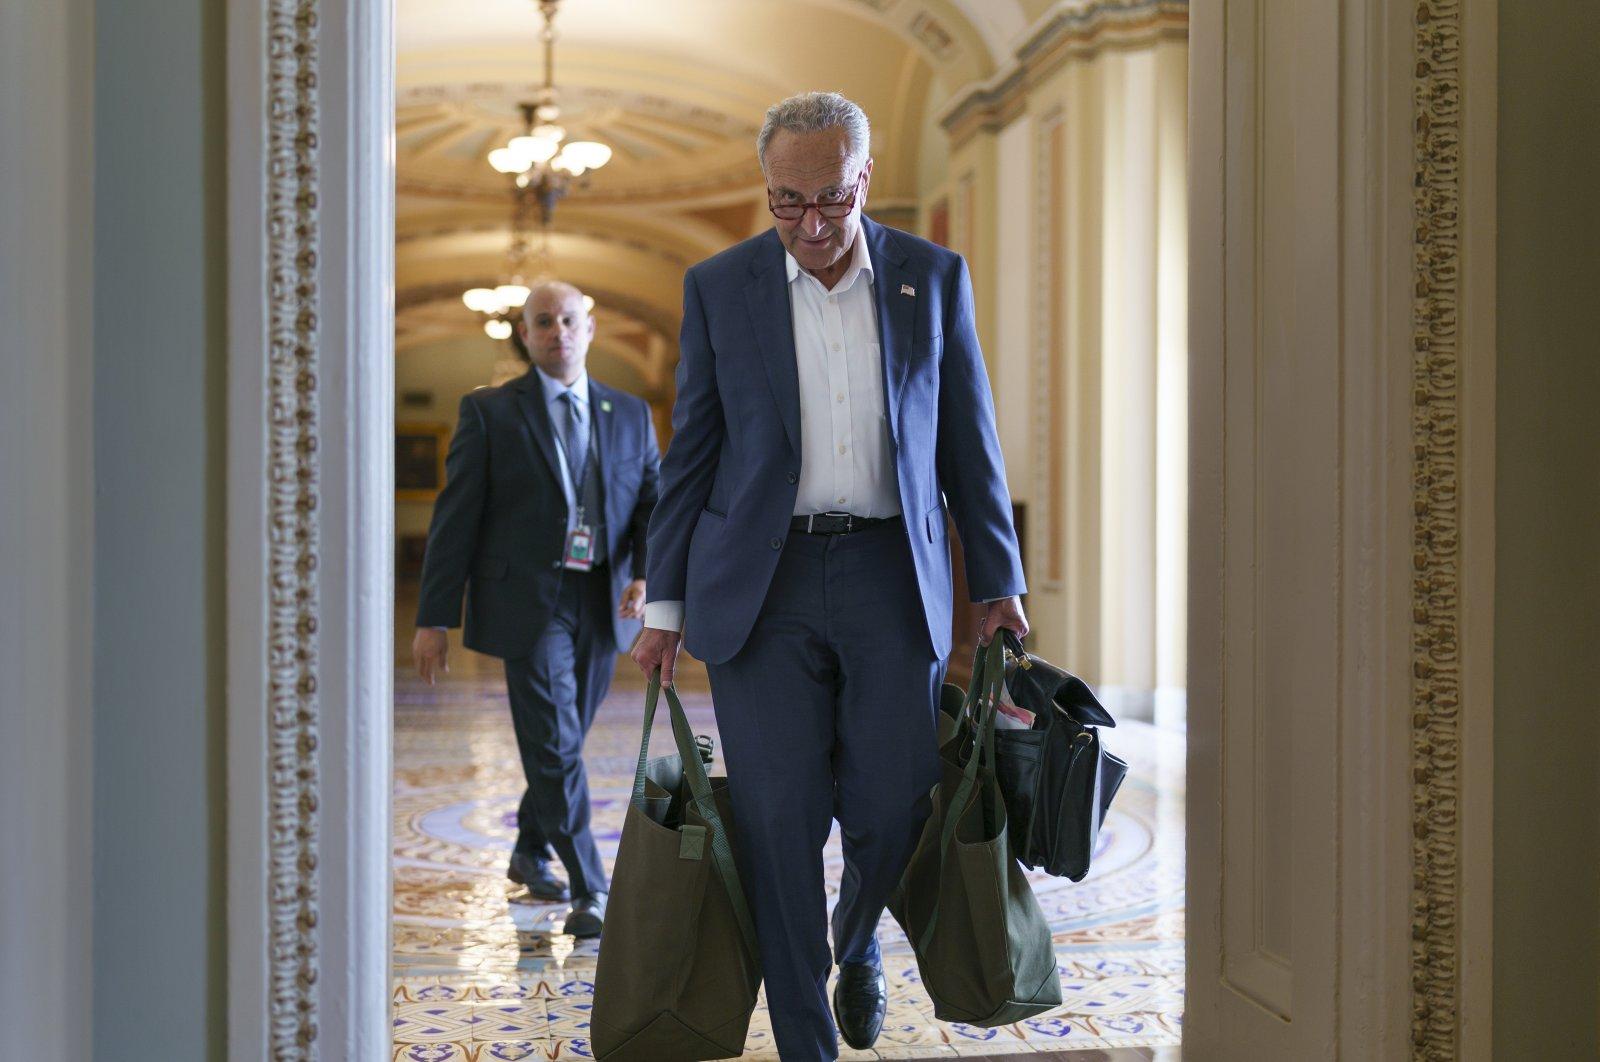 Senate Majority Leader Chuck Schumer arrives at the Capitol in Washington, U.S., July 12, 2021. (AP Photo)